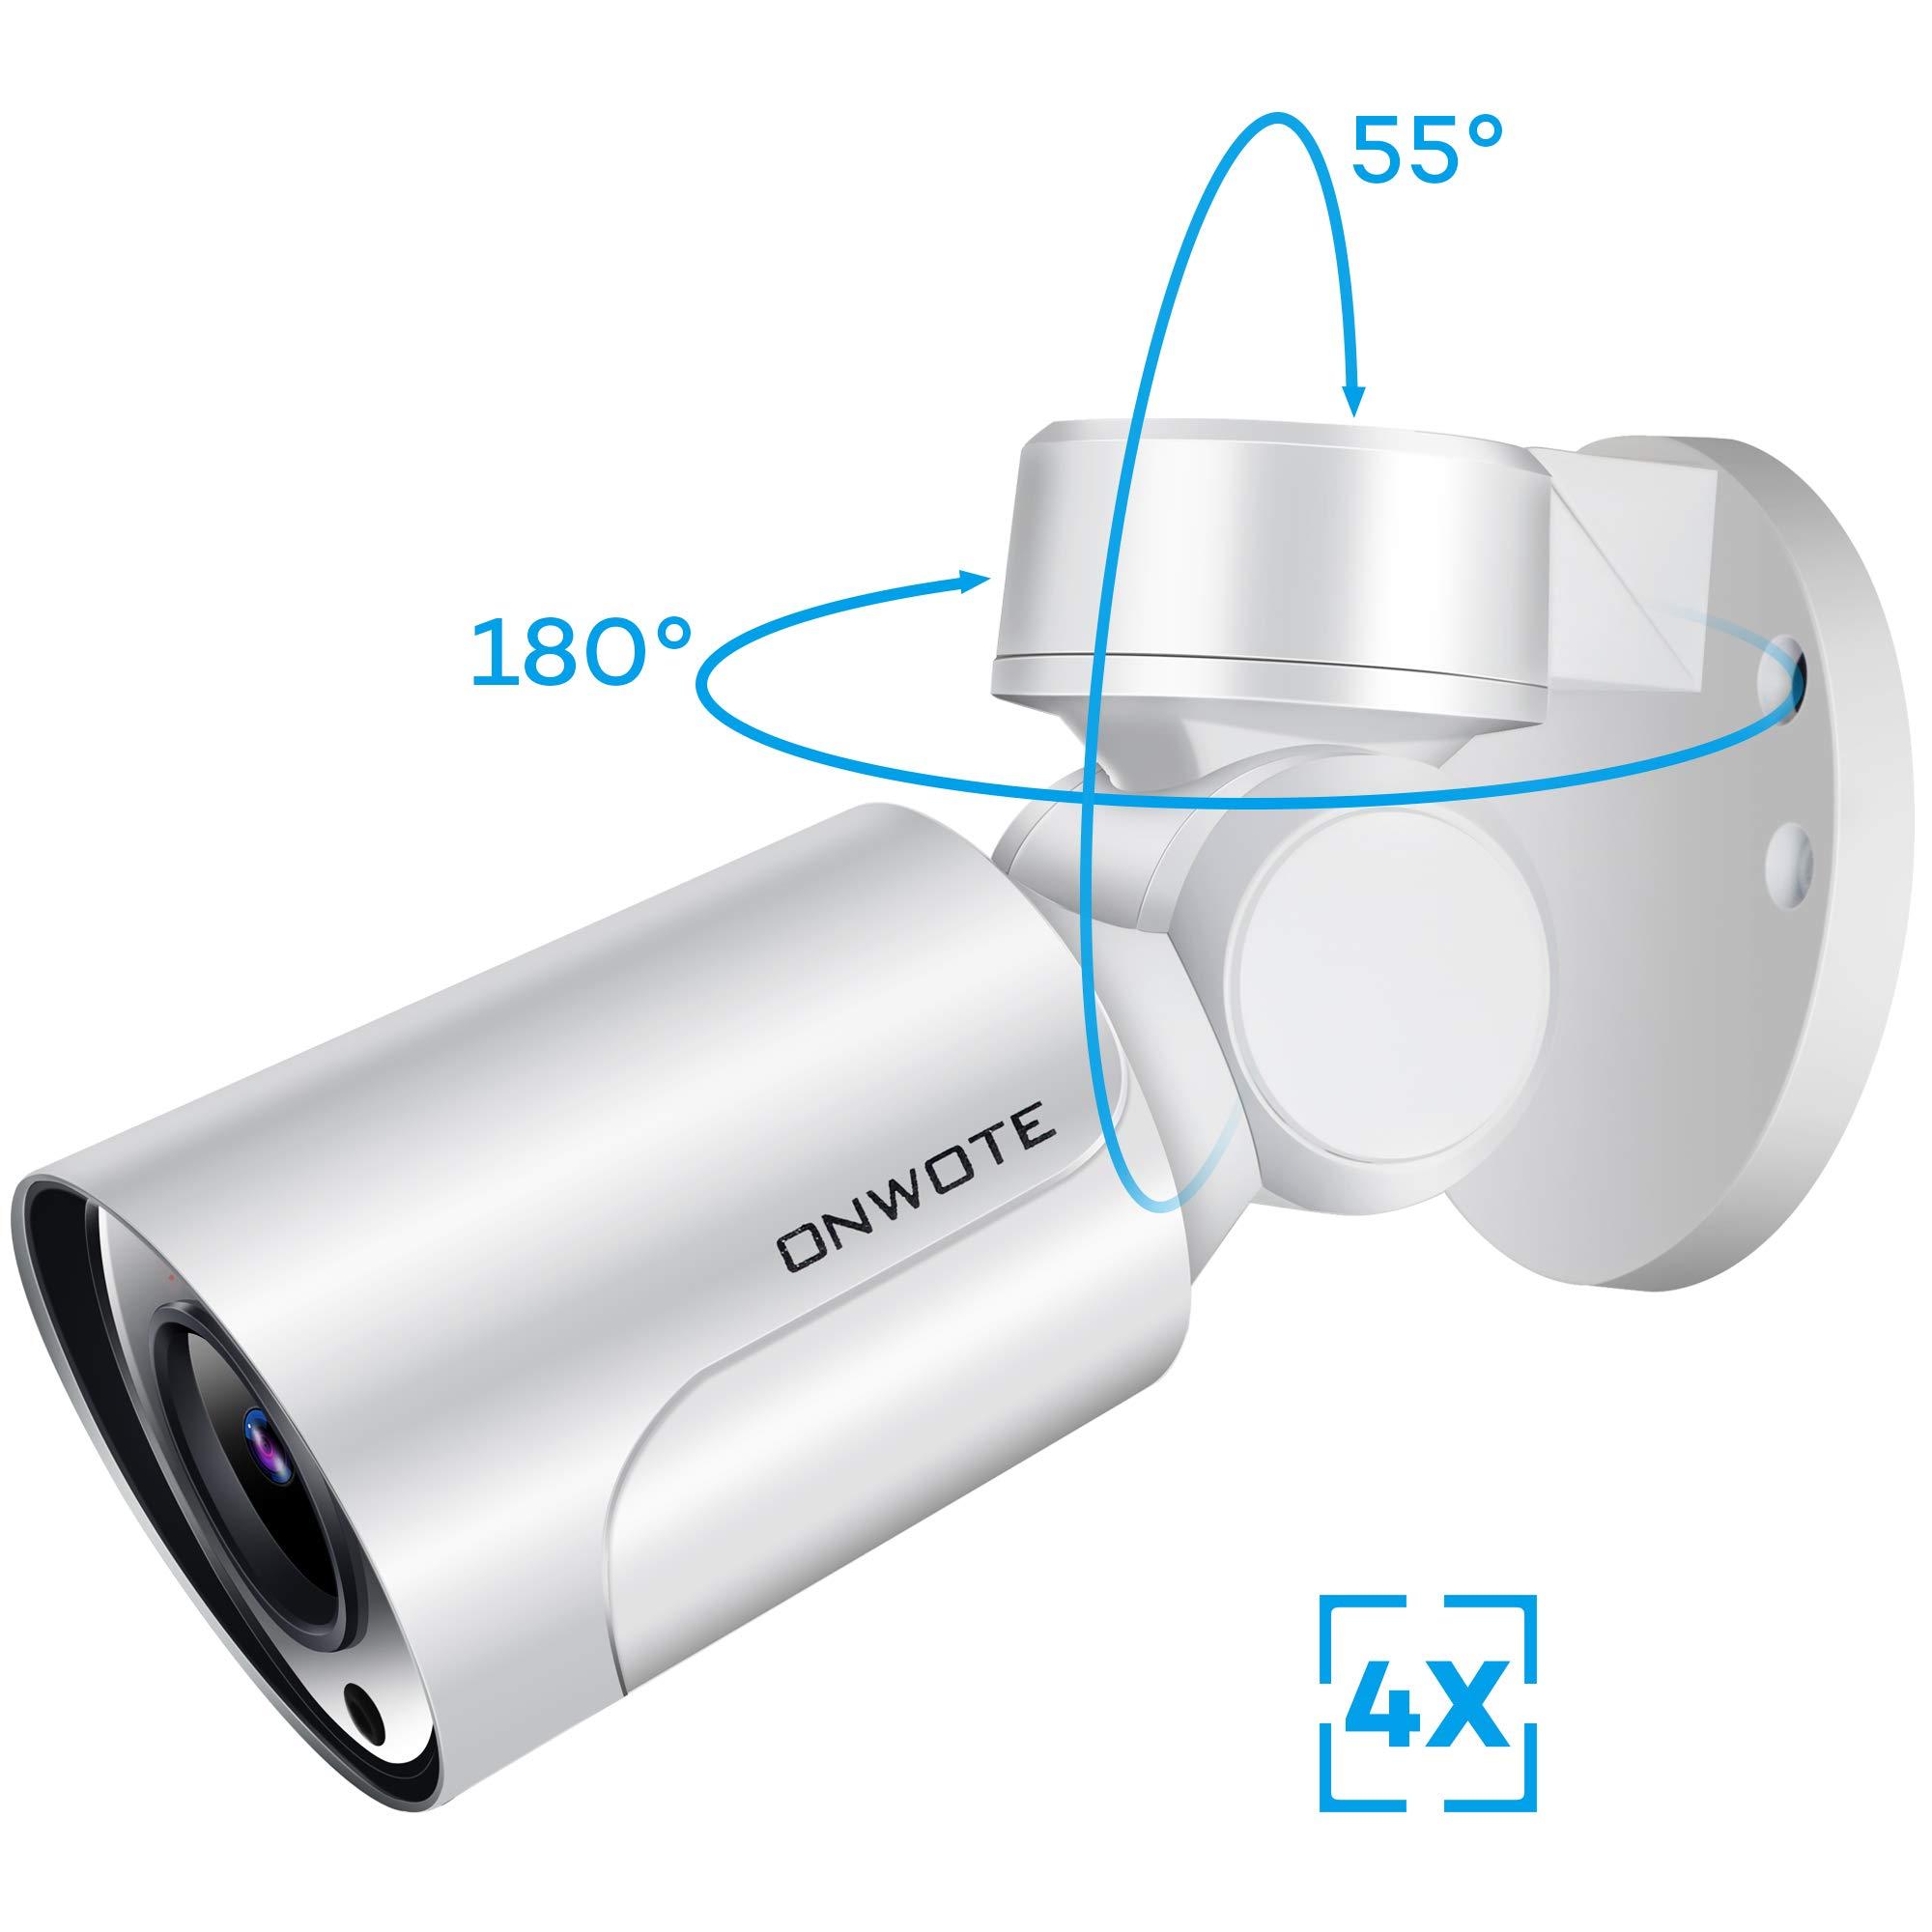 ONWOTE 5MP HD Outdoor IP PTZ PoE Security Camera with Audio, 2592x1944P Super HD, 180° Pan 55° Tilt 4X Optical Zoom Autofocus, Onvif Ethernet Camera, 2.8-12mm Lens, IP65 Waterproof